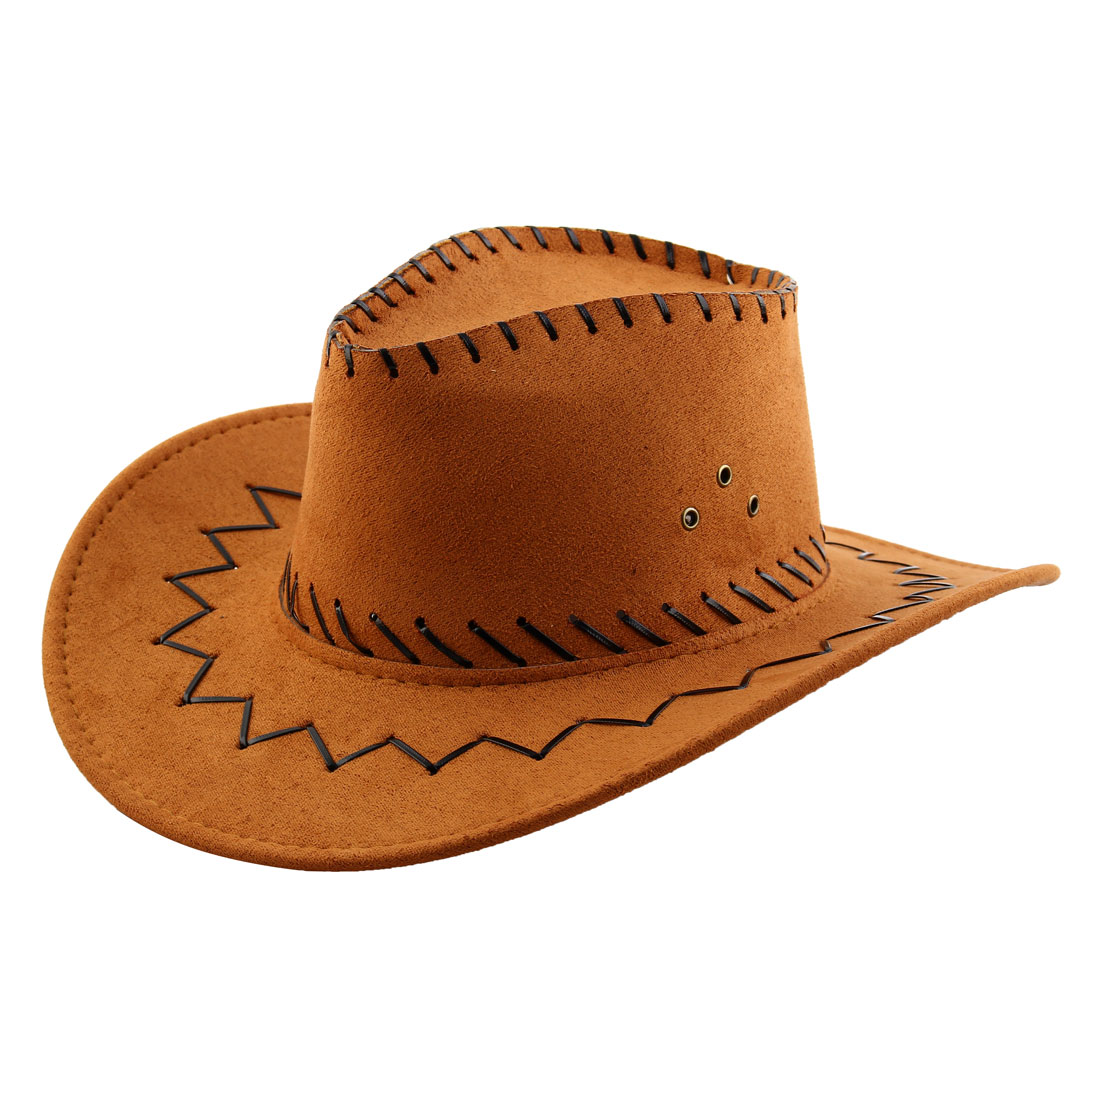 Adult Adjustable Strap Wide Brim Western Style Sunhat Cowboy Hat Light Brown